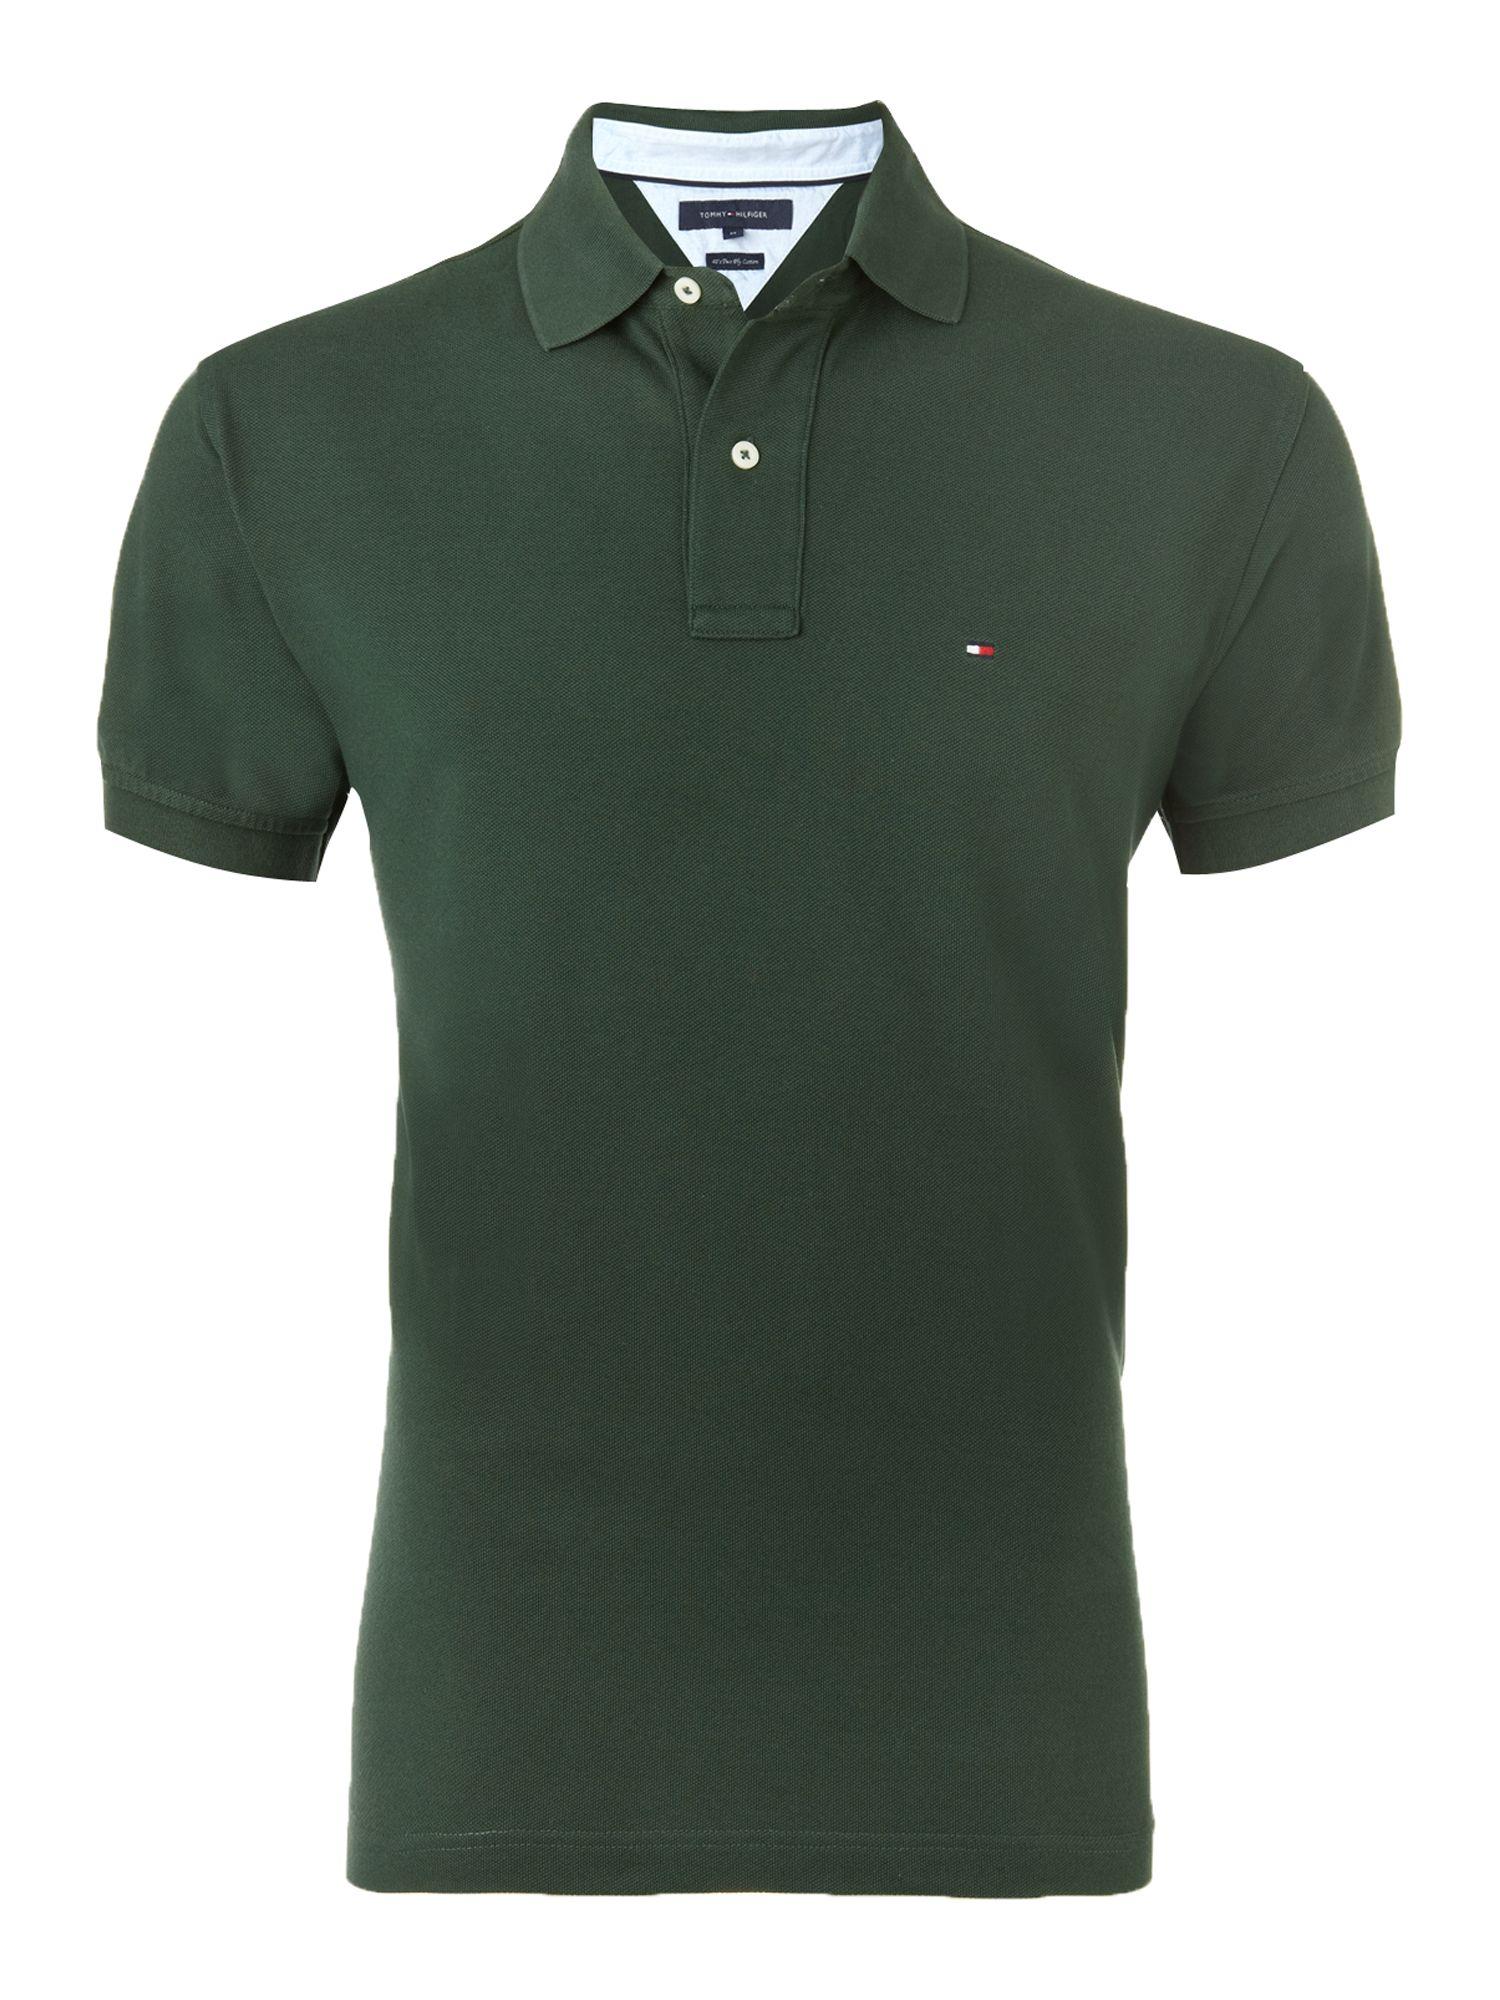 tommy hilfiger knit regular fit polo shirt in green for. Black Bedroom Furniture Sets. Home Design Ideas